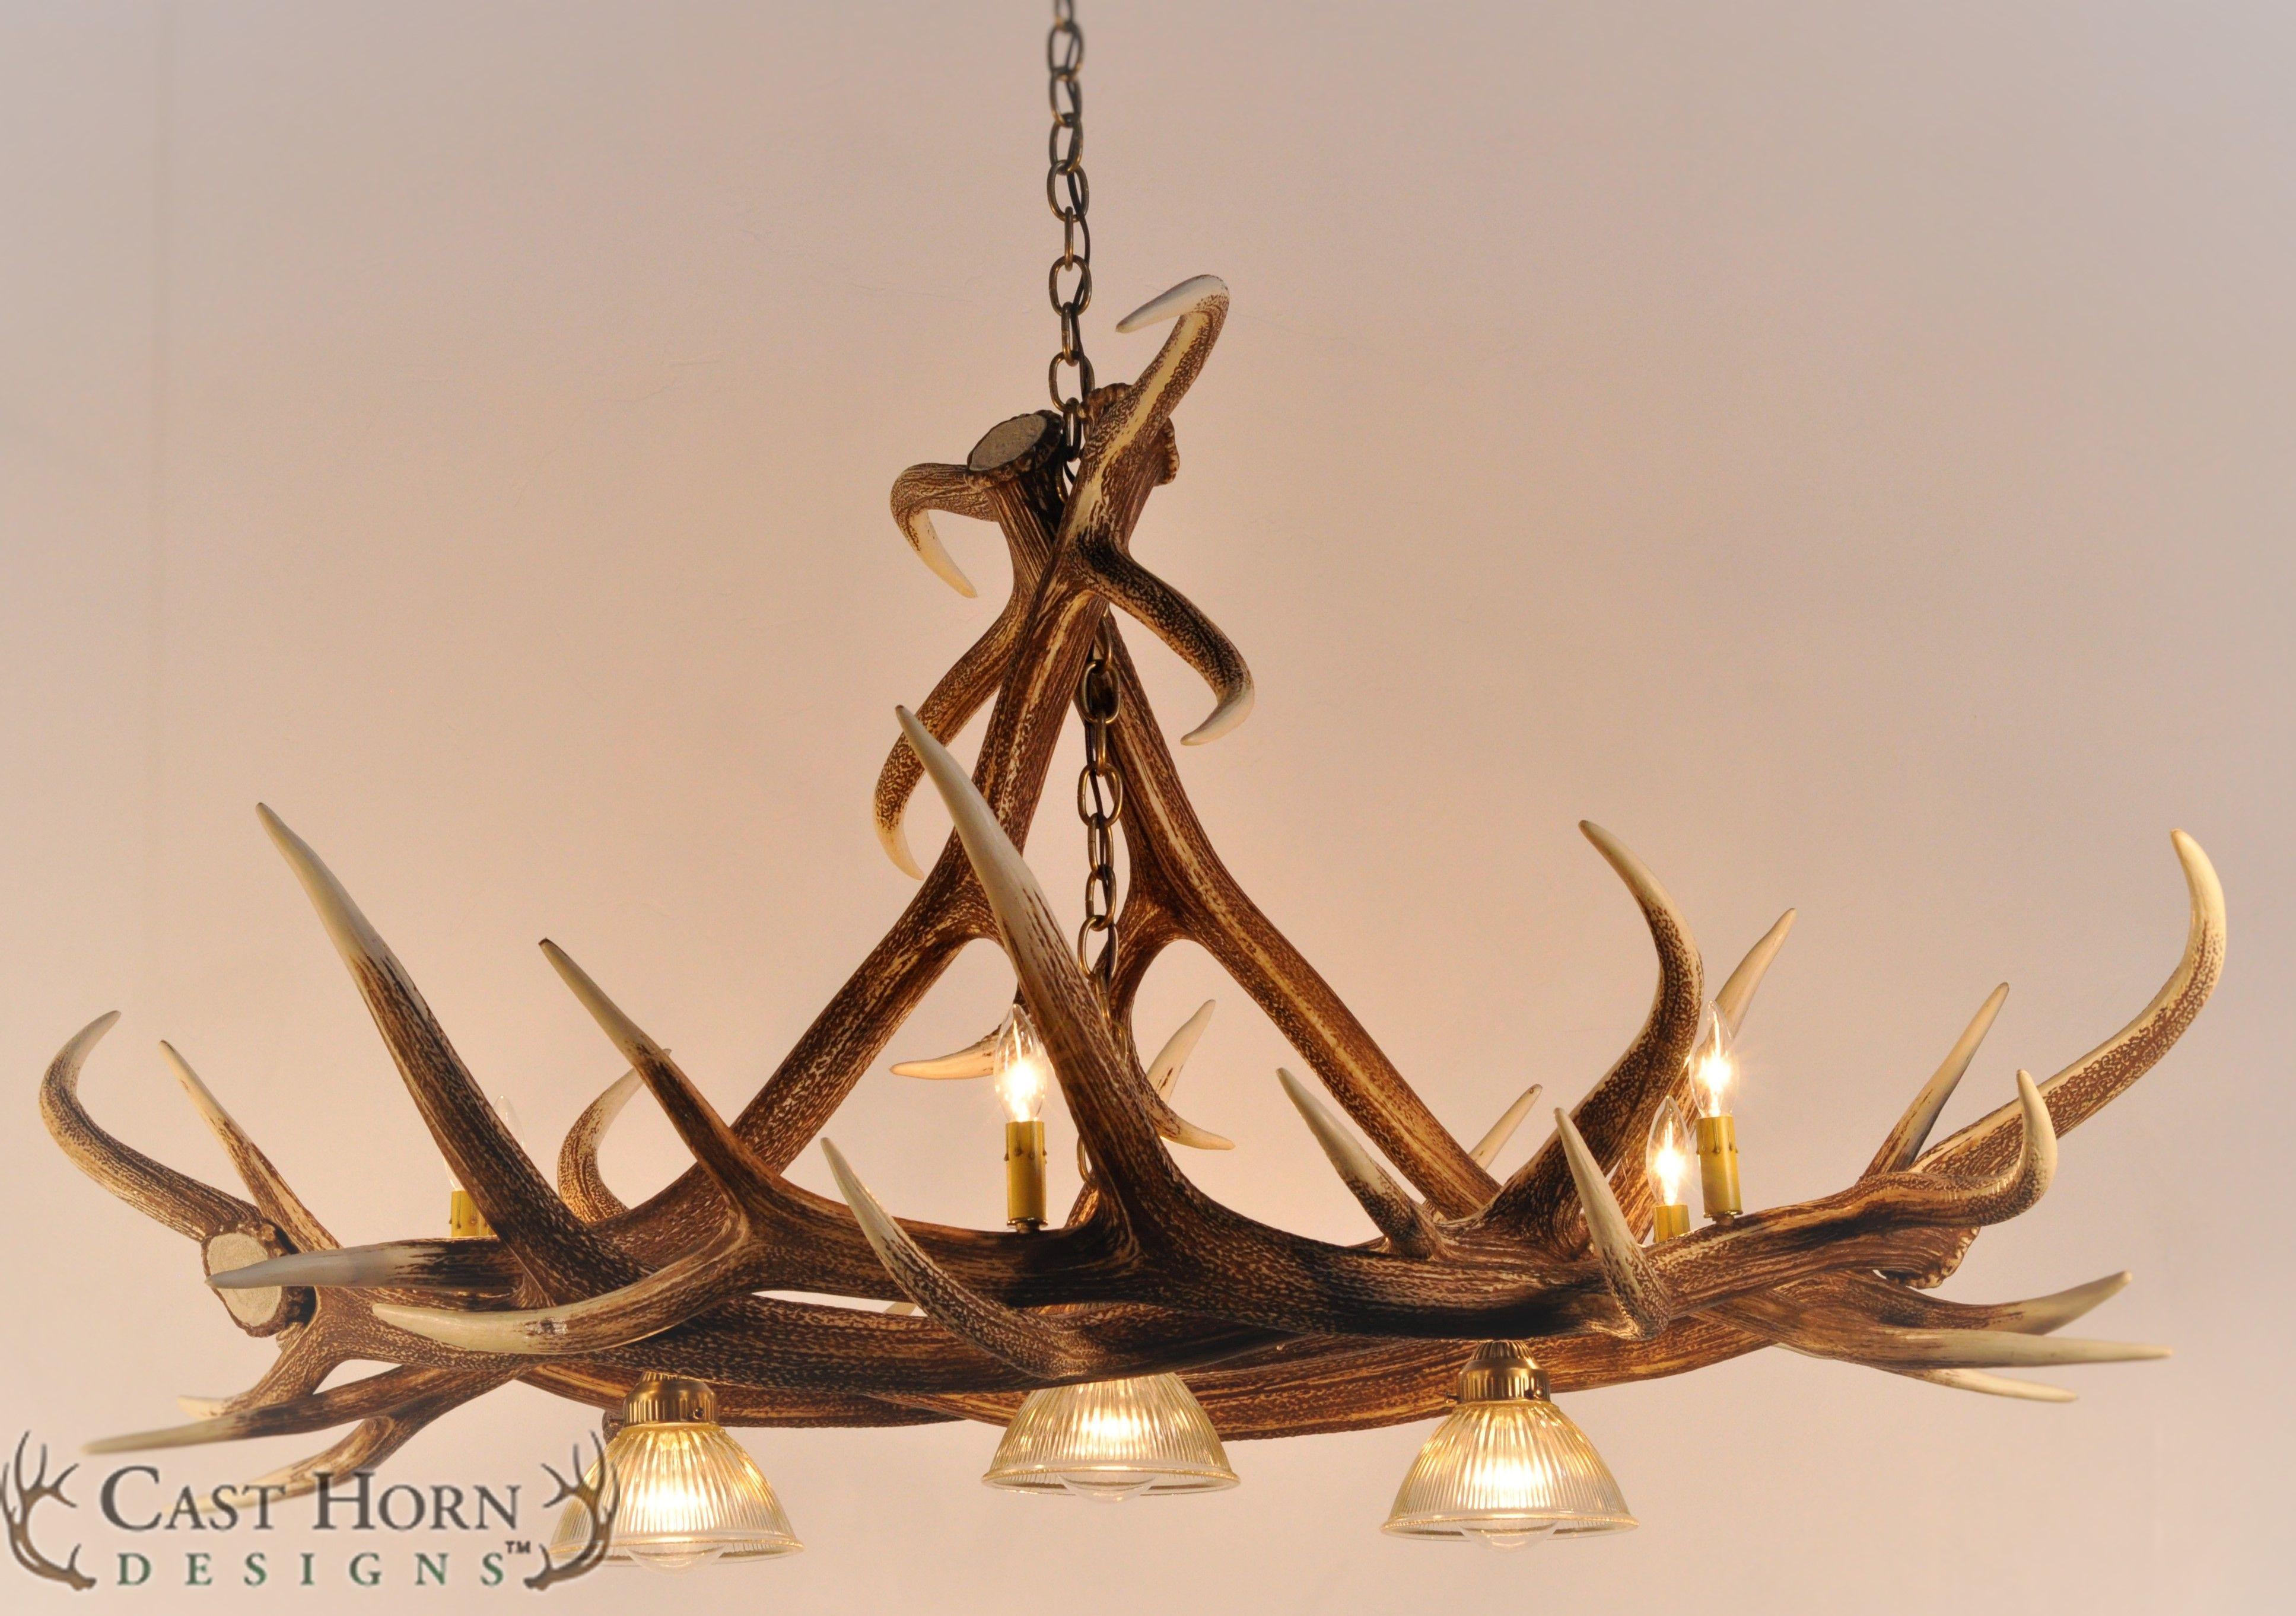 Elk 6 antler chandelier with 3 downlights by cast horn designs elk 6 antler chandelier with 3 downlights by cast horn designs aloadofball Choice Image